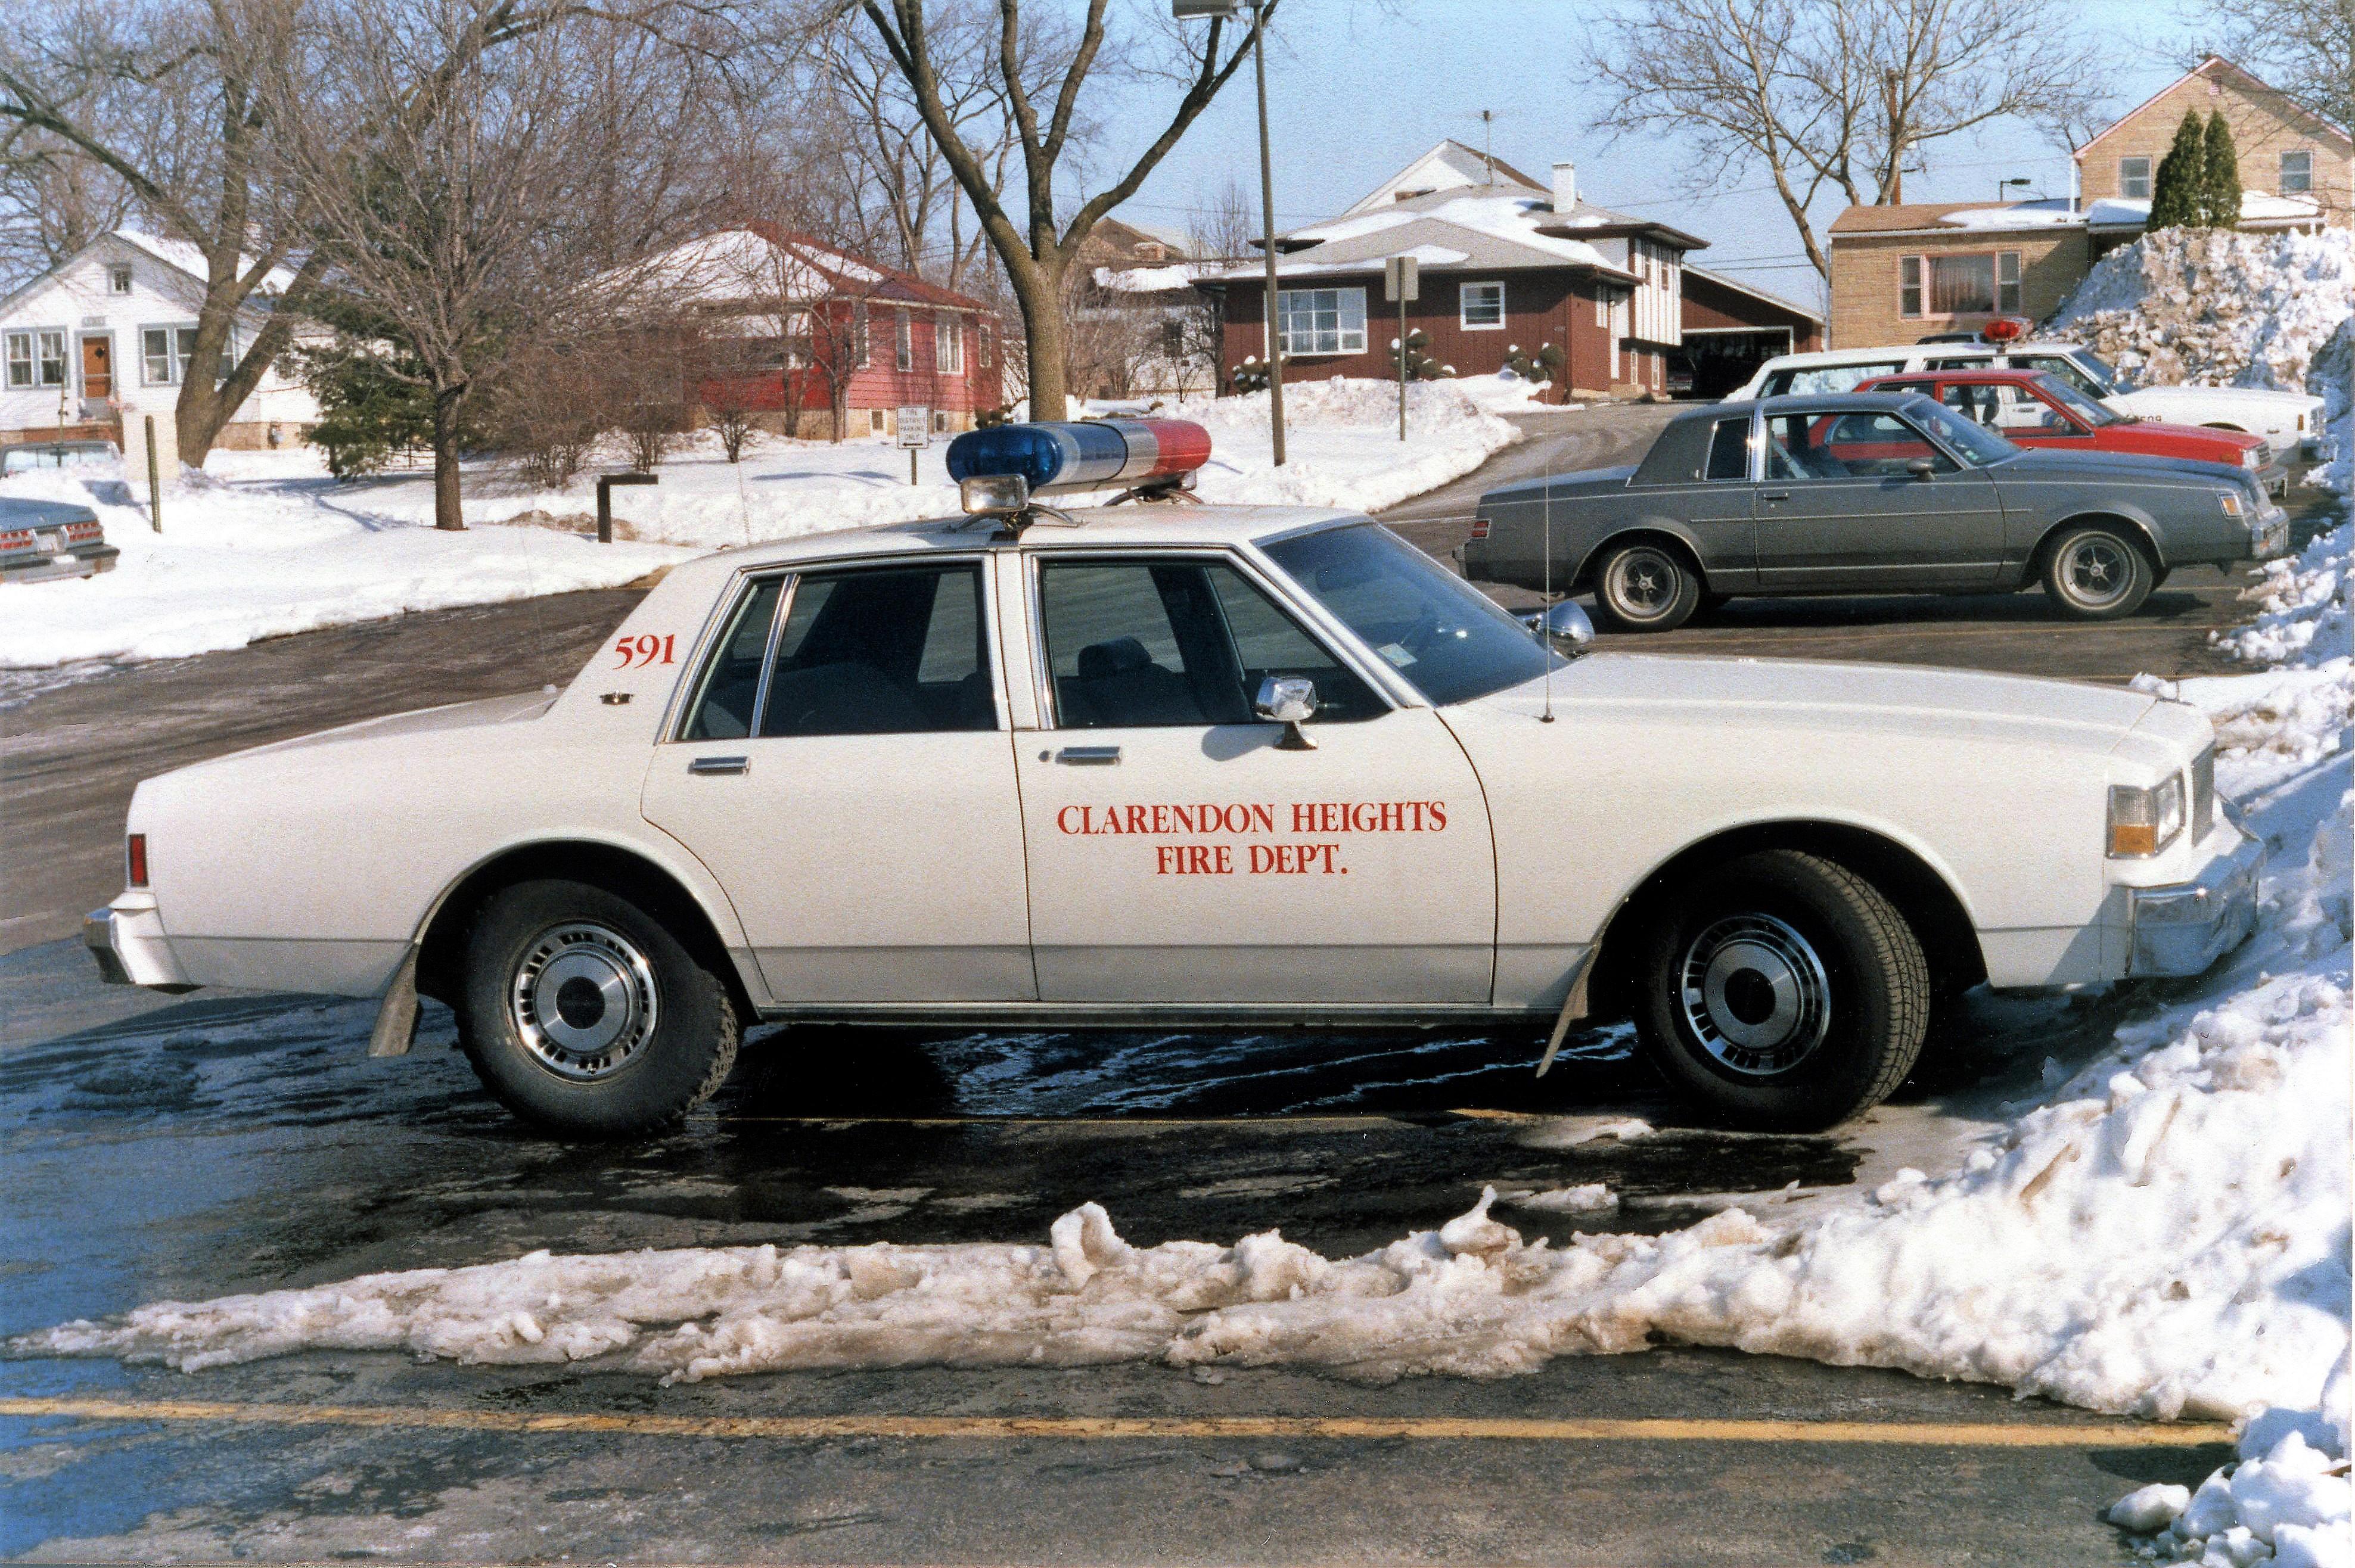 CLARENDON HEIGHTS CAR 591